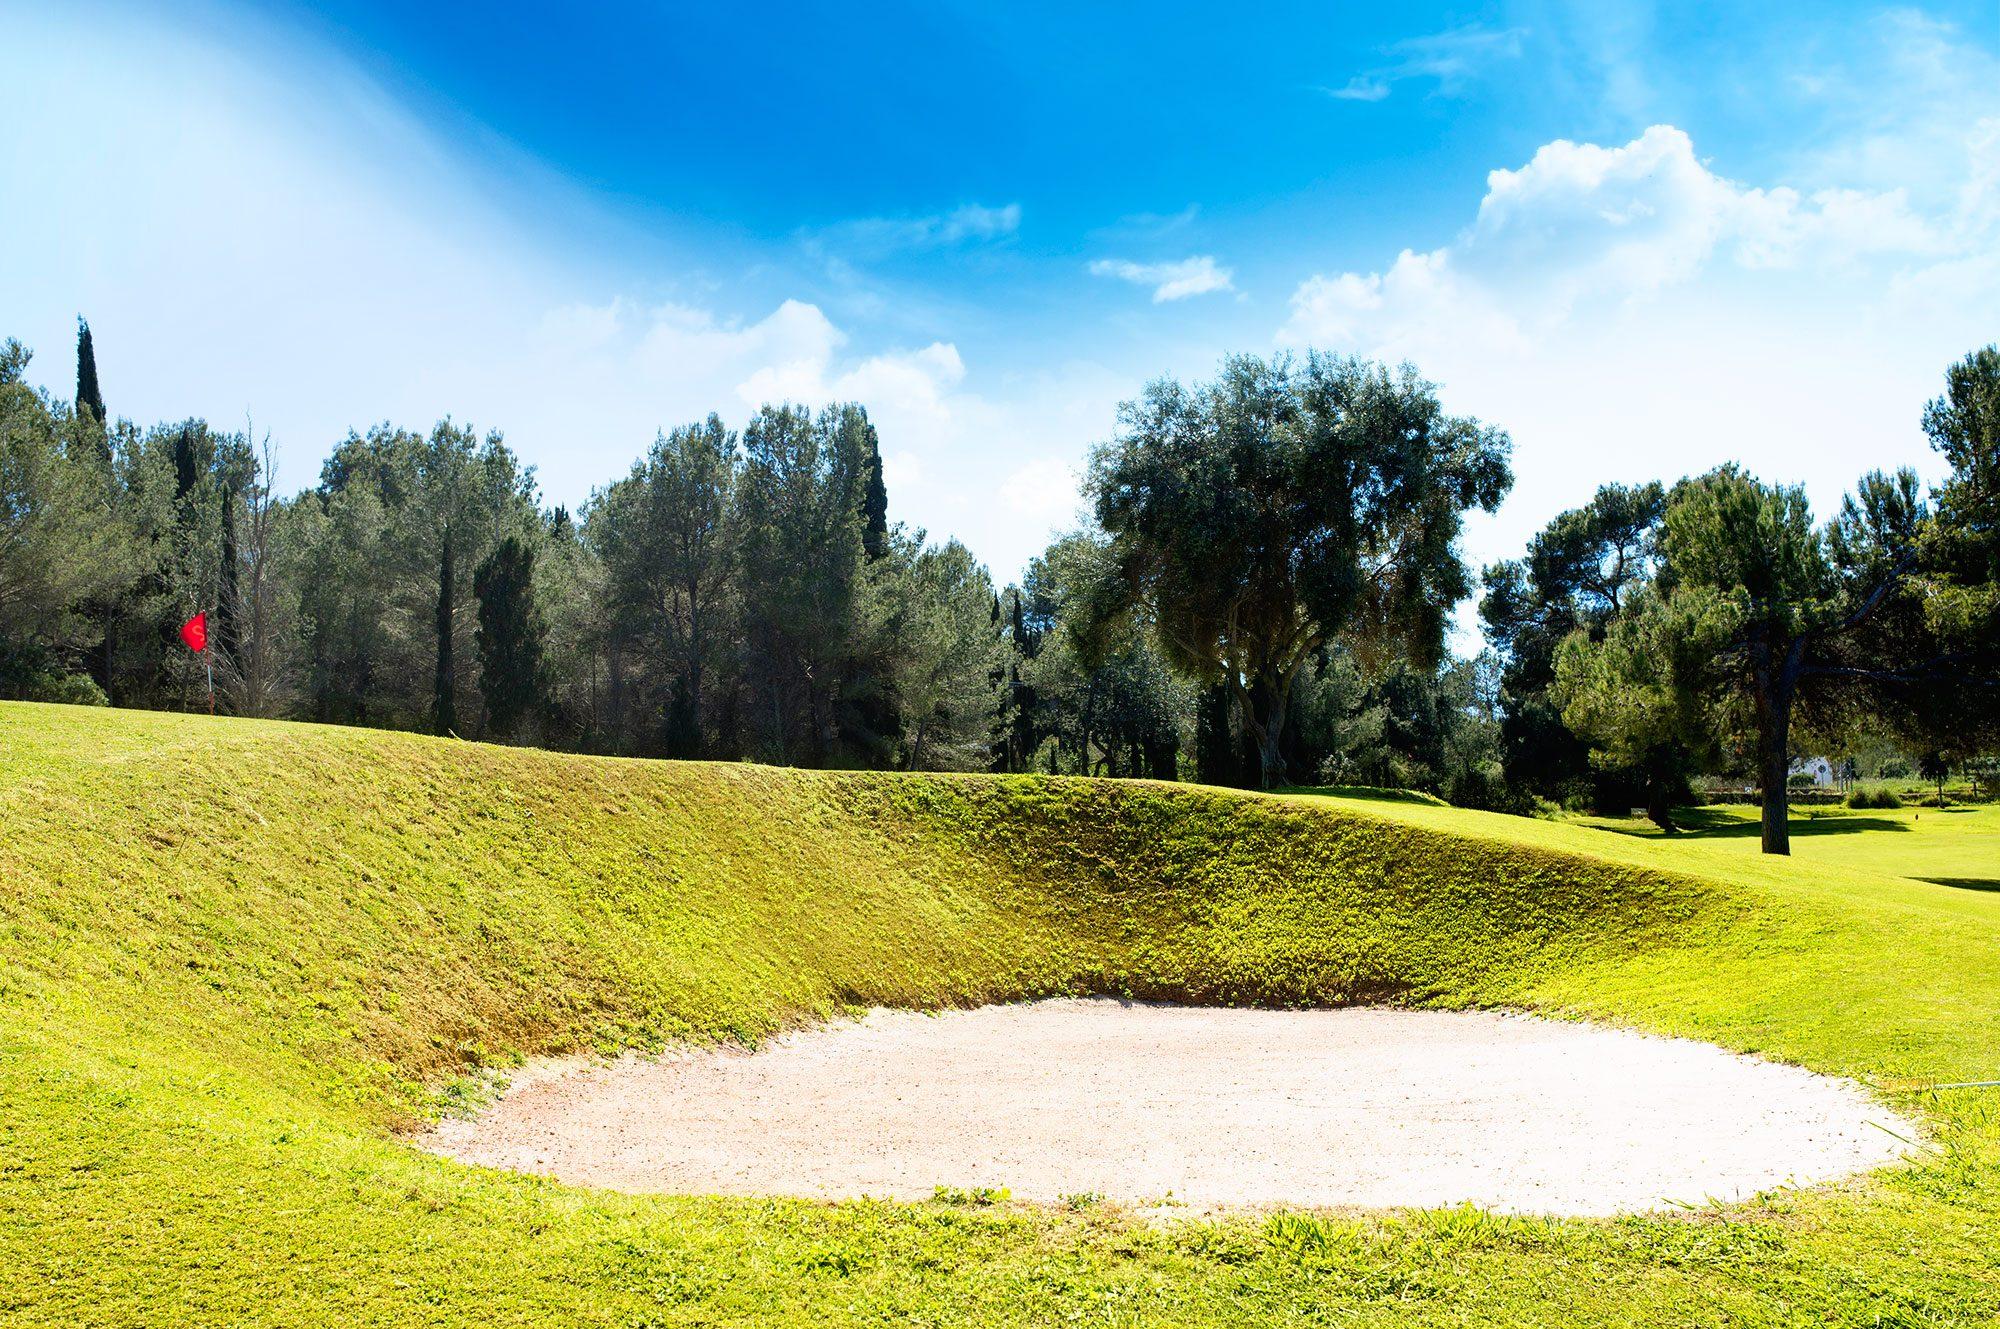 Golf ibiza roca llisa 9 holes golf ibiza - Roca llisa ibiza ...